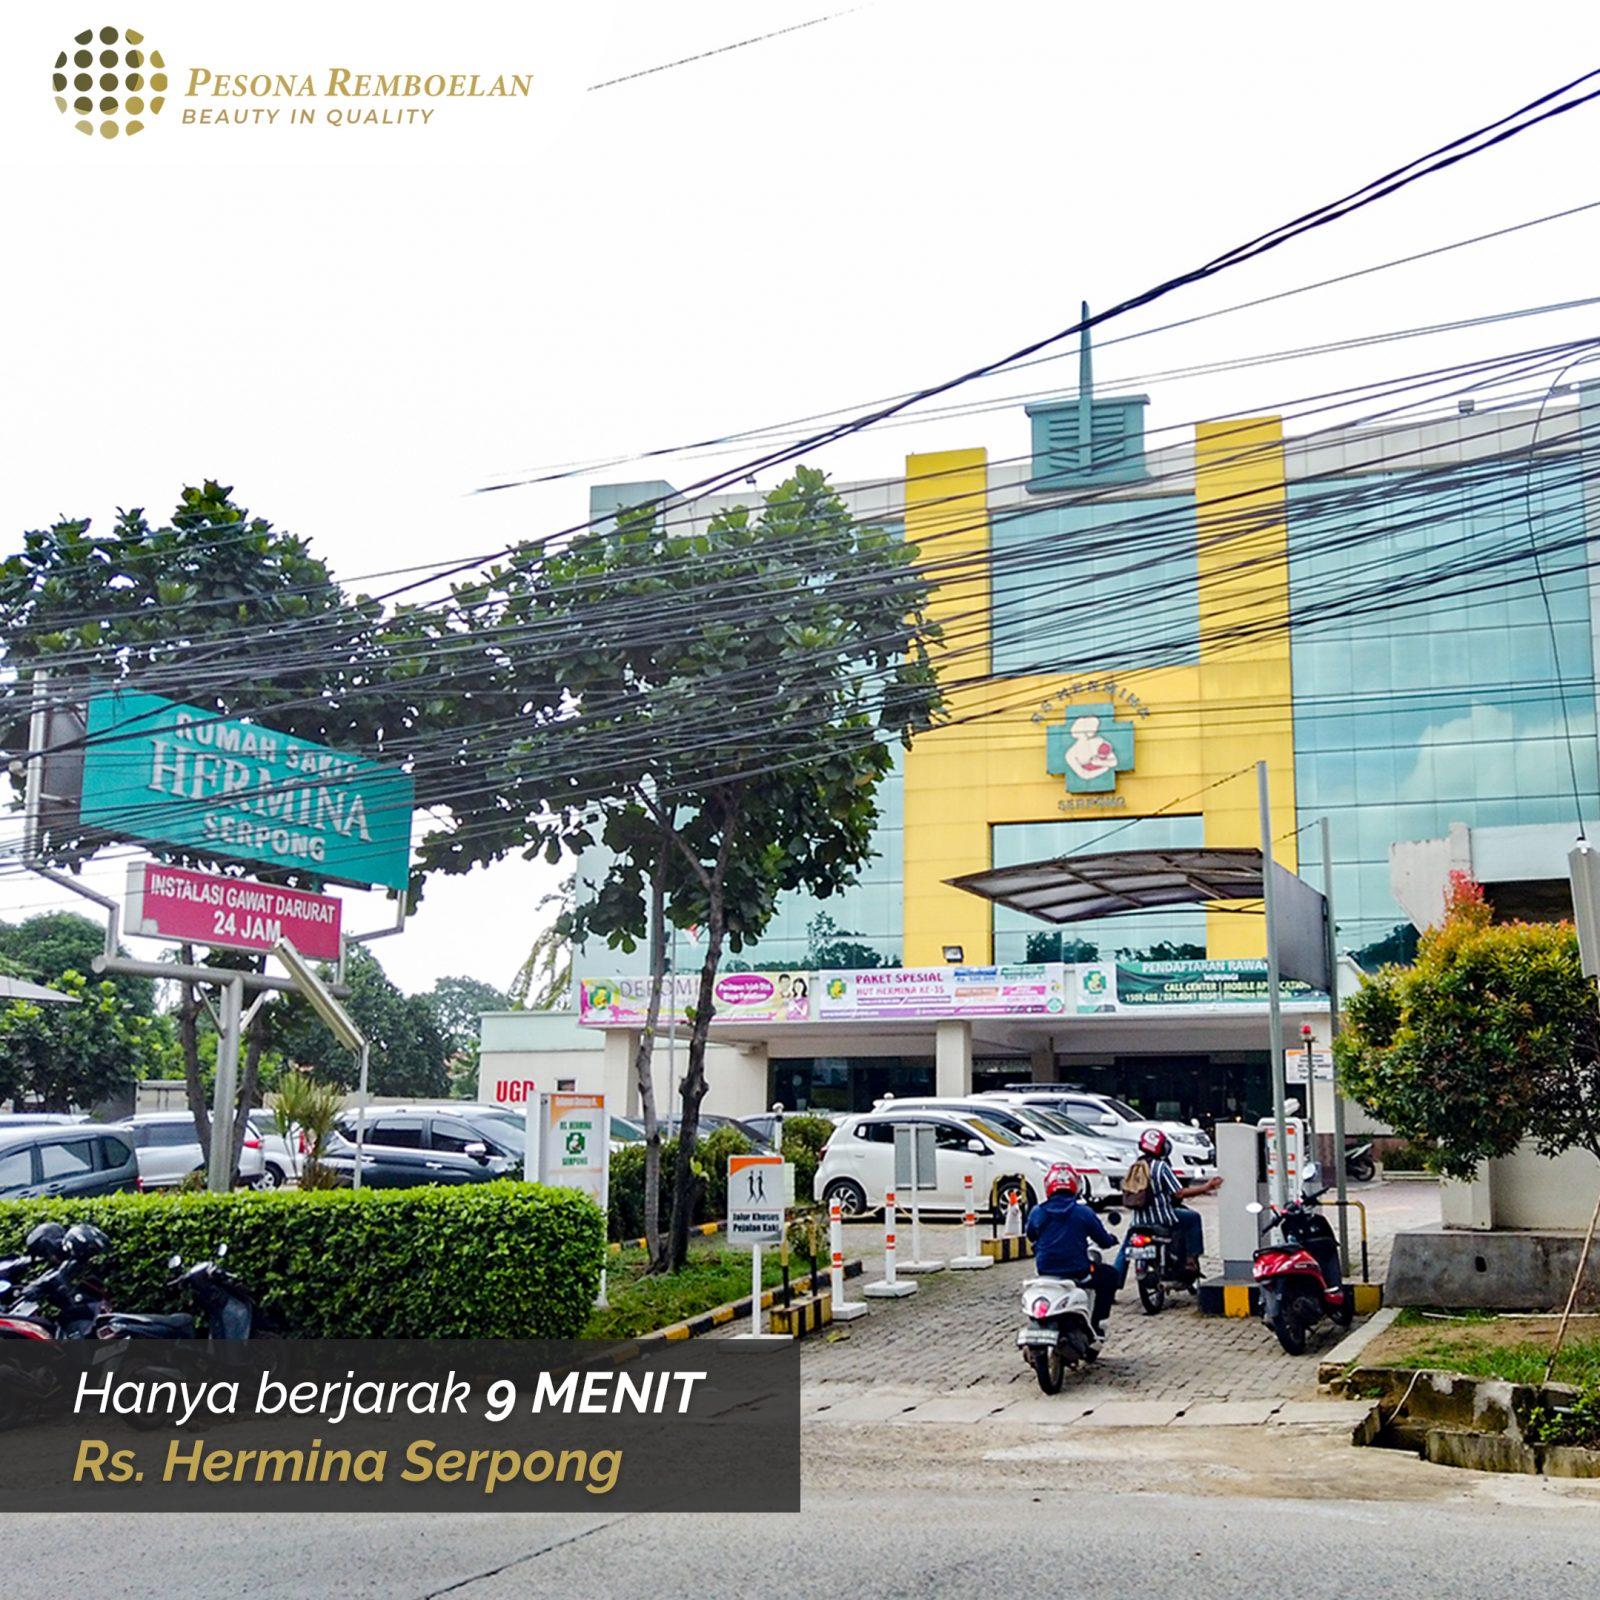 Pesona Remboelan Serpong - Rumah 2 Lantai Cukup DP 34 Juta Langsung Akad 16